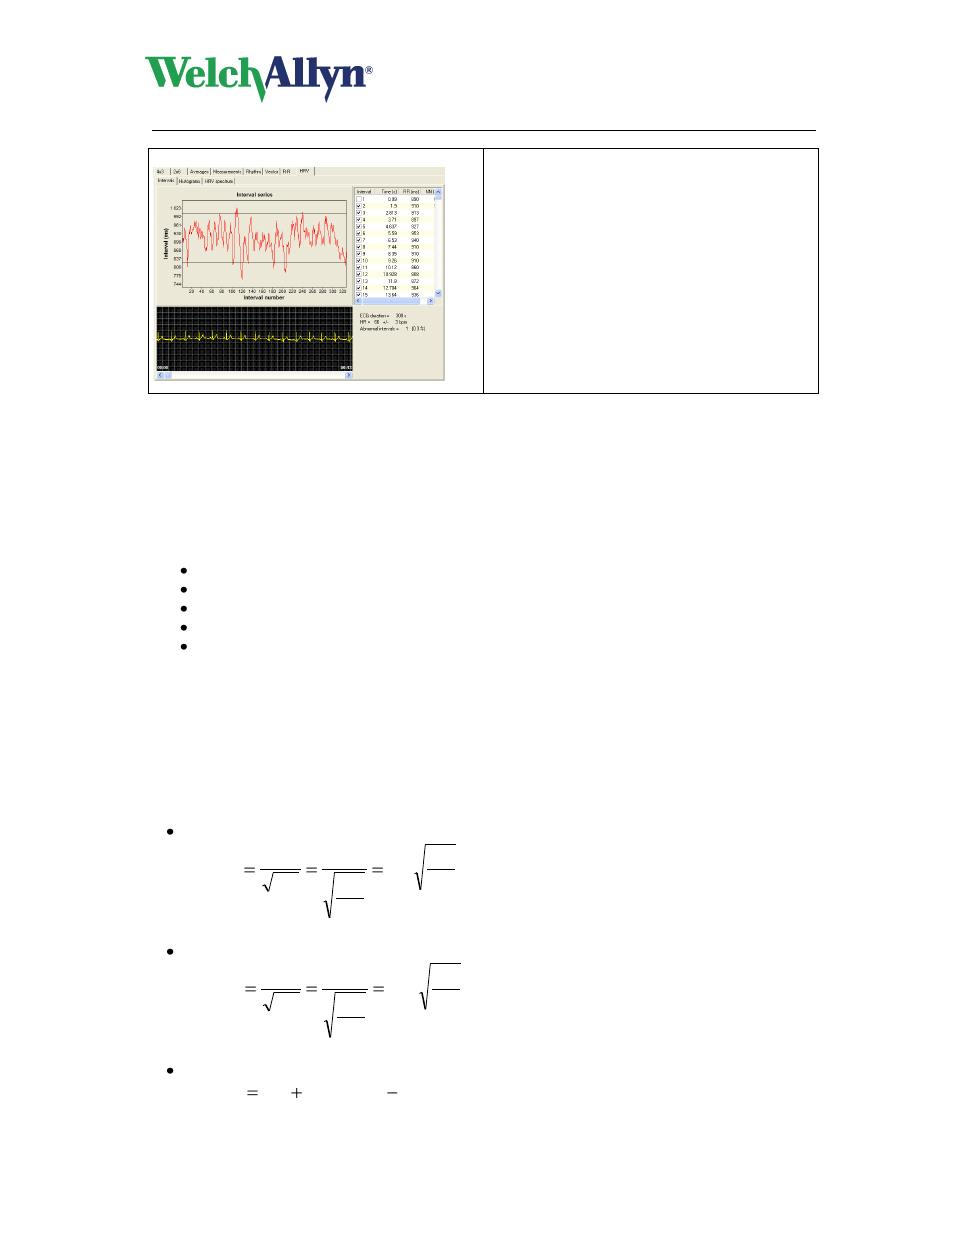 Parameters, Cardioperfect workstation, Resting ecg module